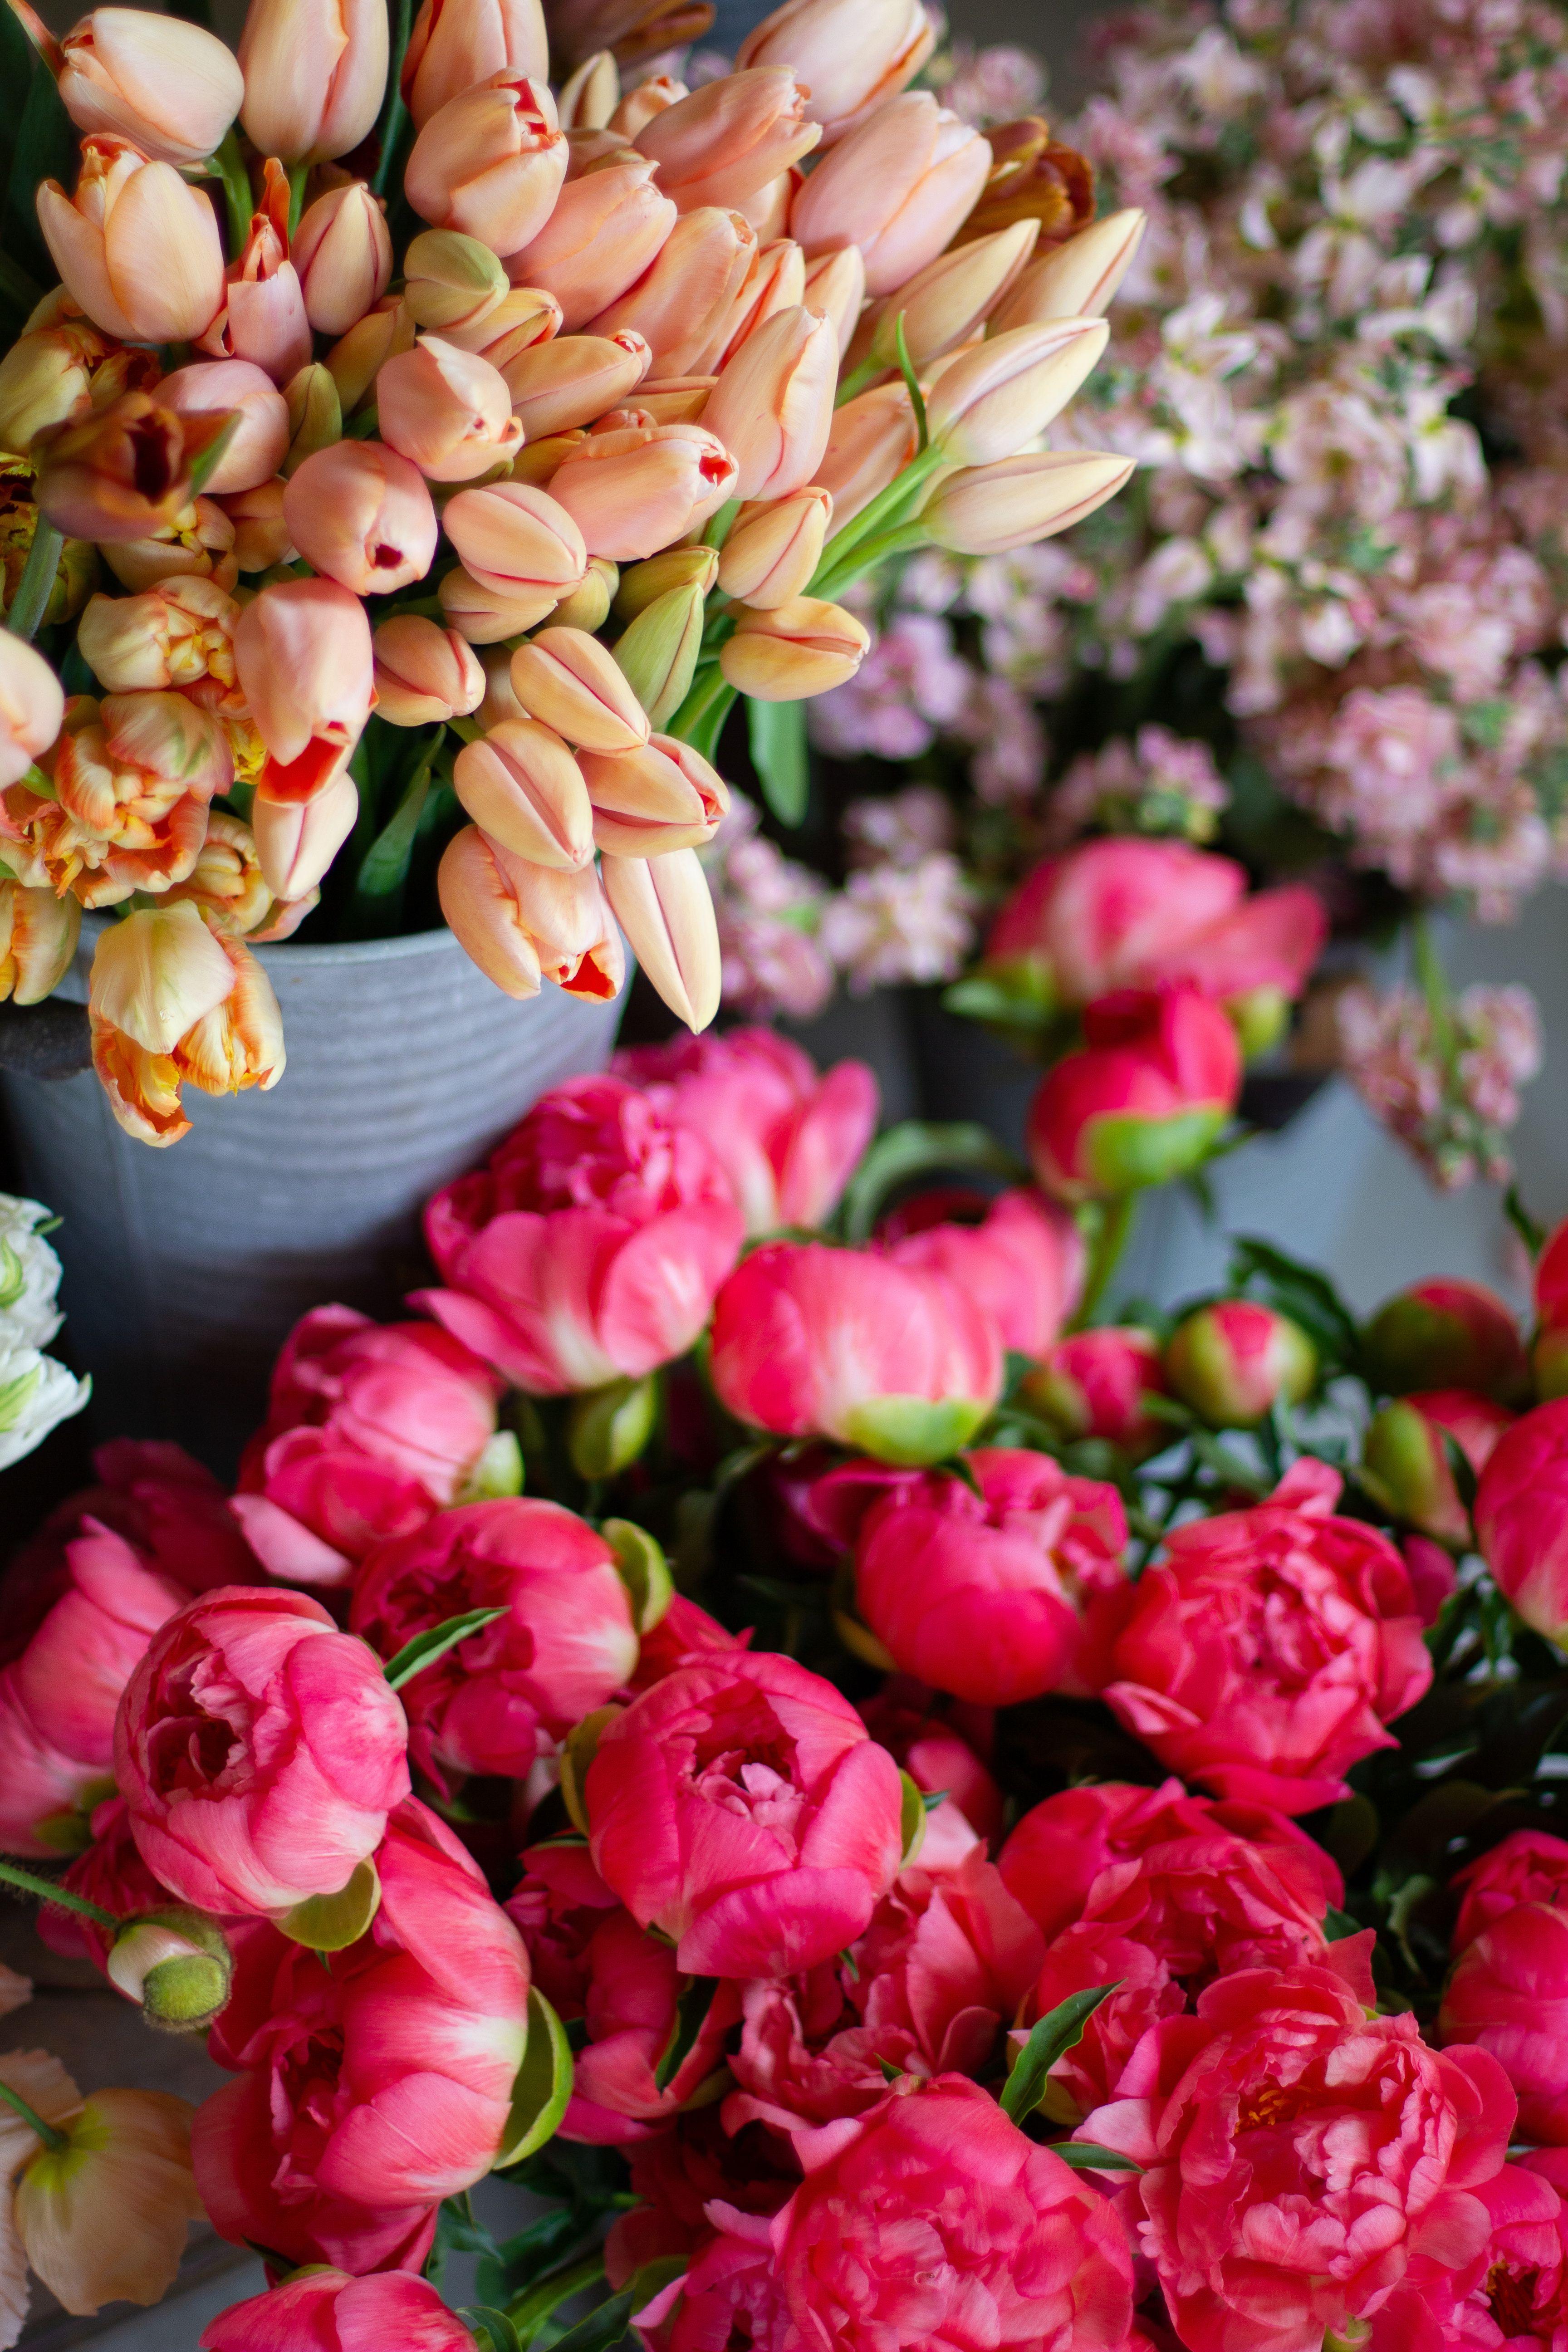 Love 'n Fresh Flowers, a flower farm located in